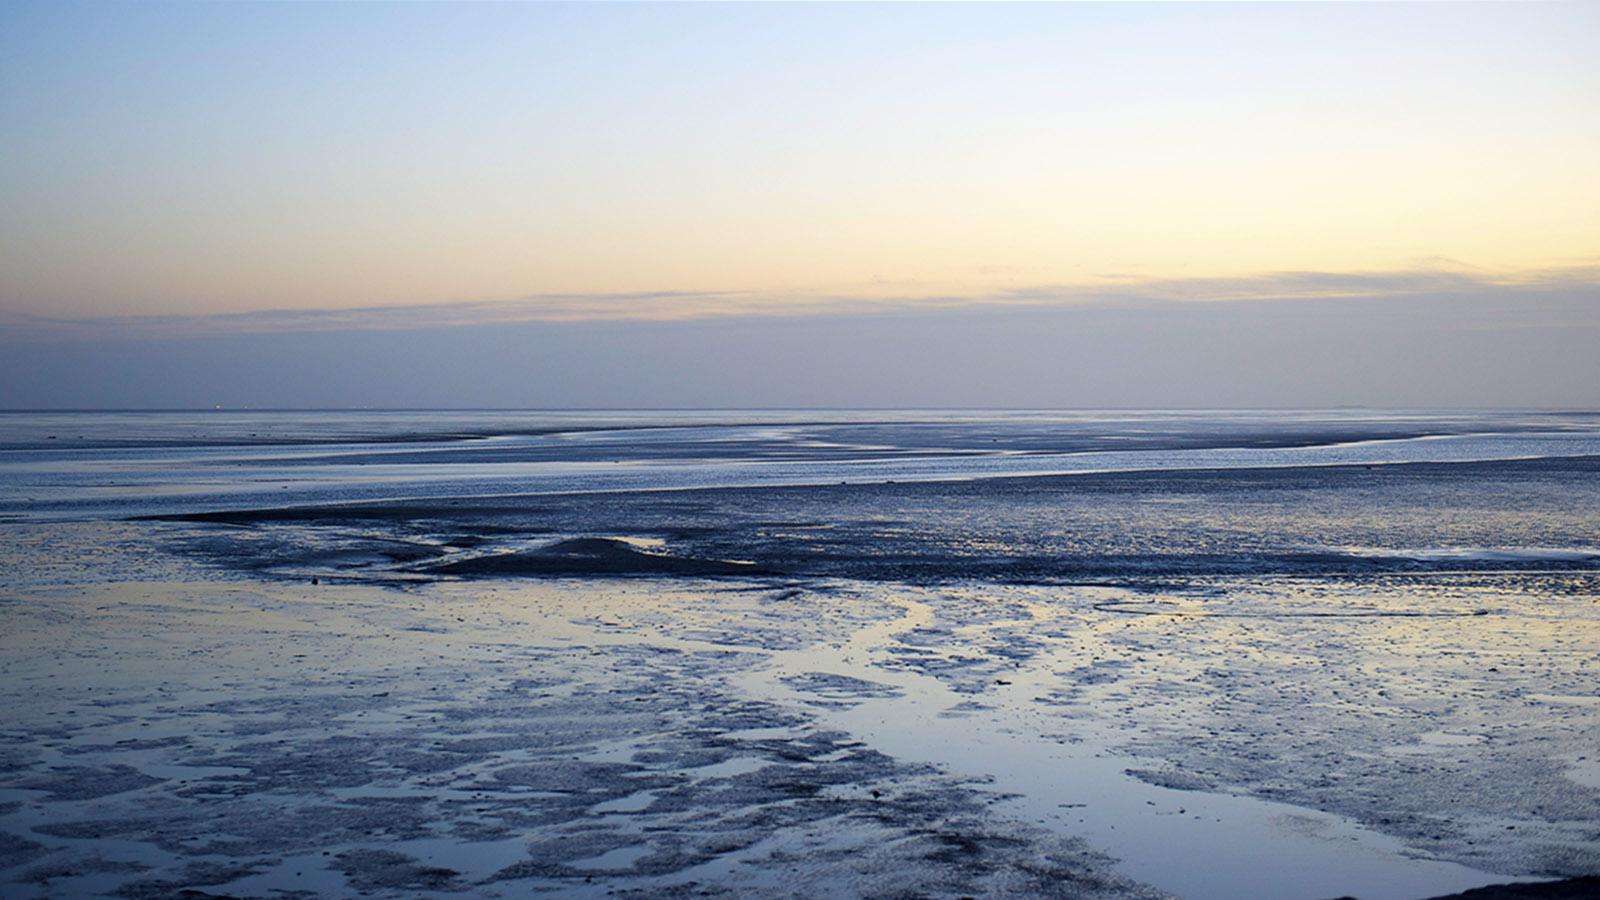 Eiderstedt, Morgens im Wattenmeer. Foto: Hilke Maunder